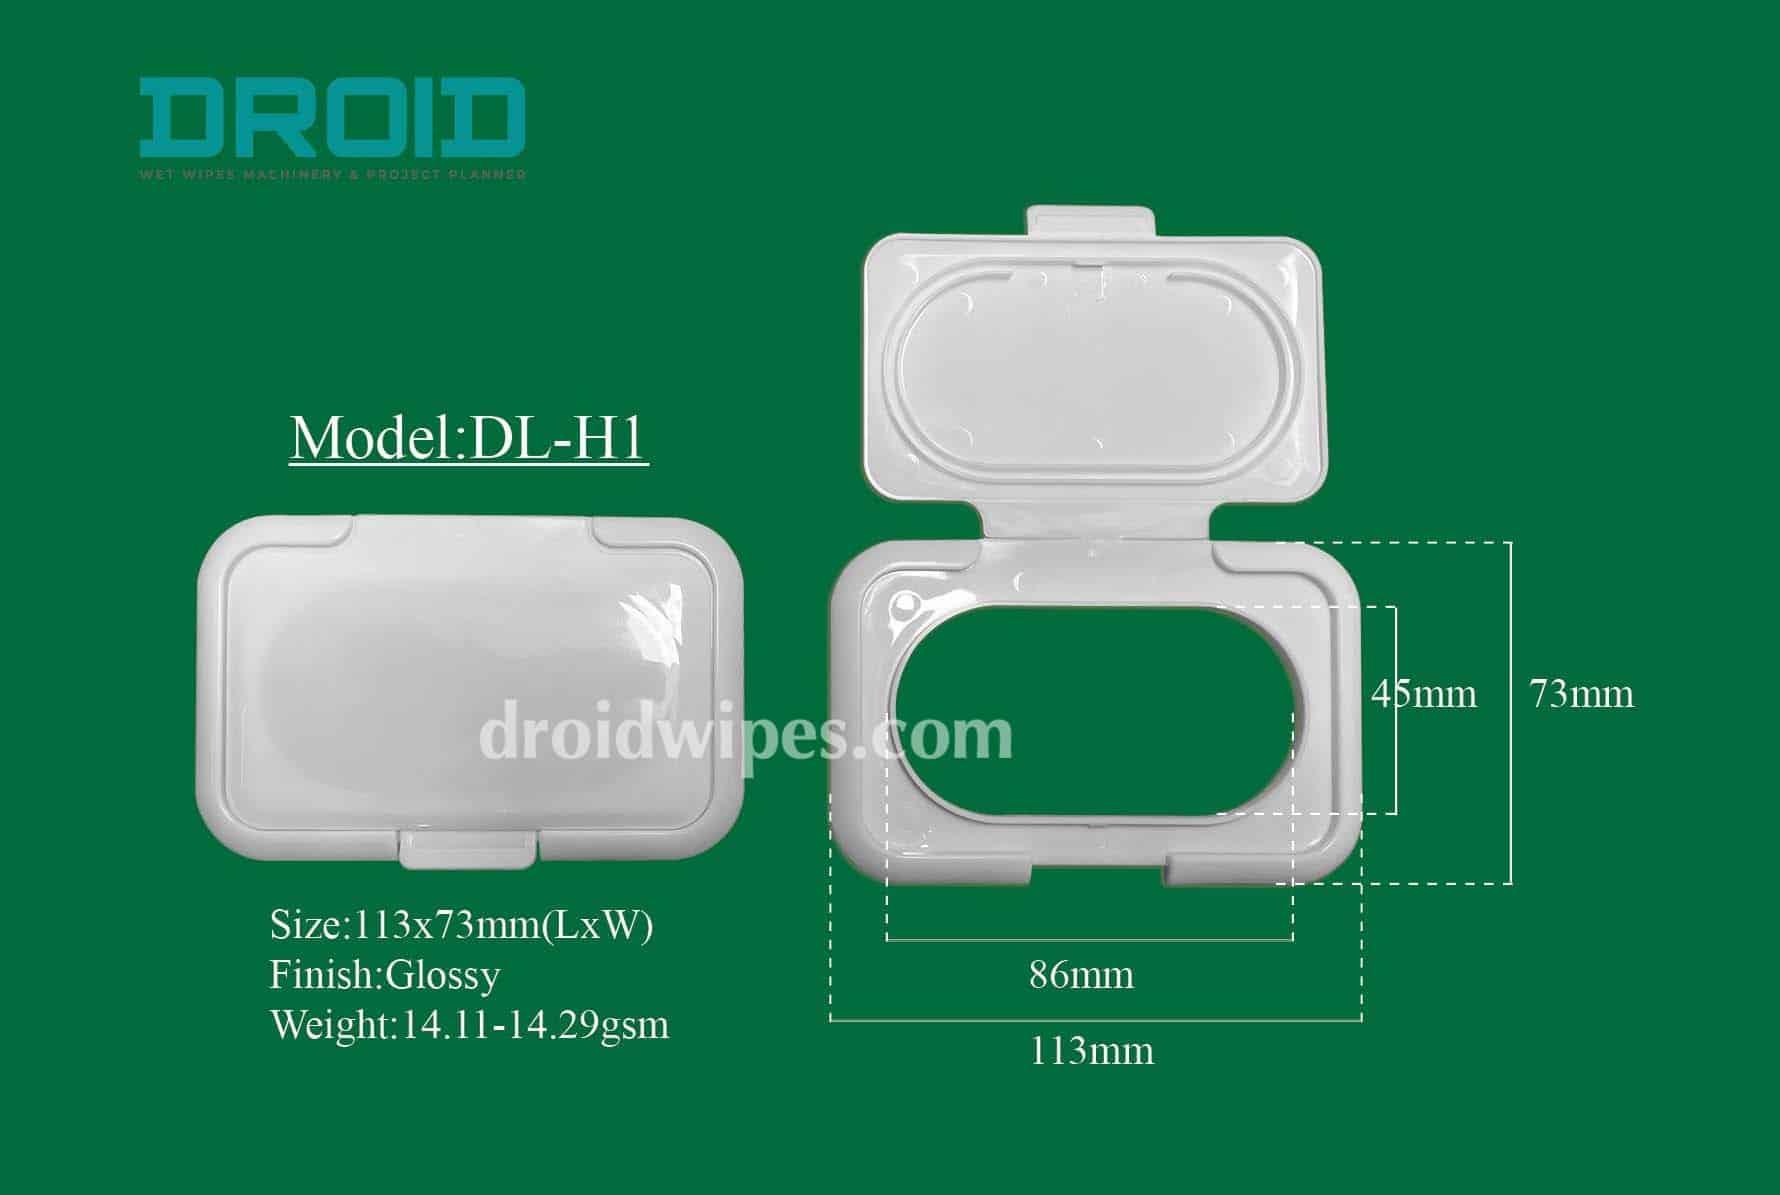 Plastic lid for wet wipes 0 - Plastic Lid for Wet Wipes